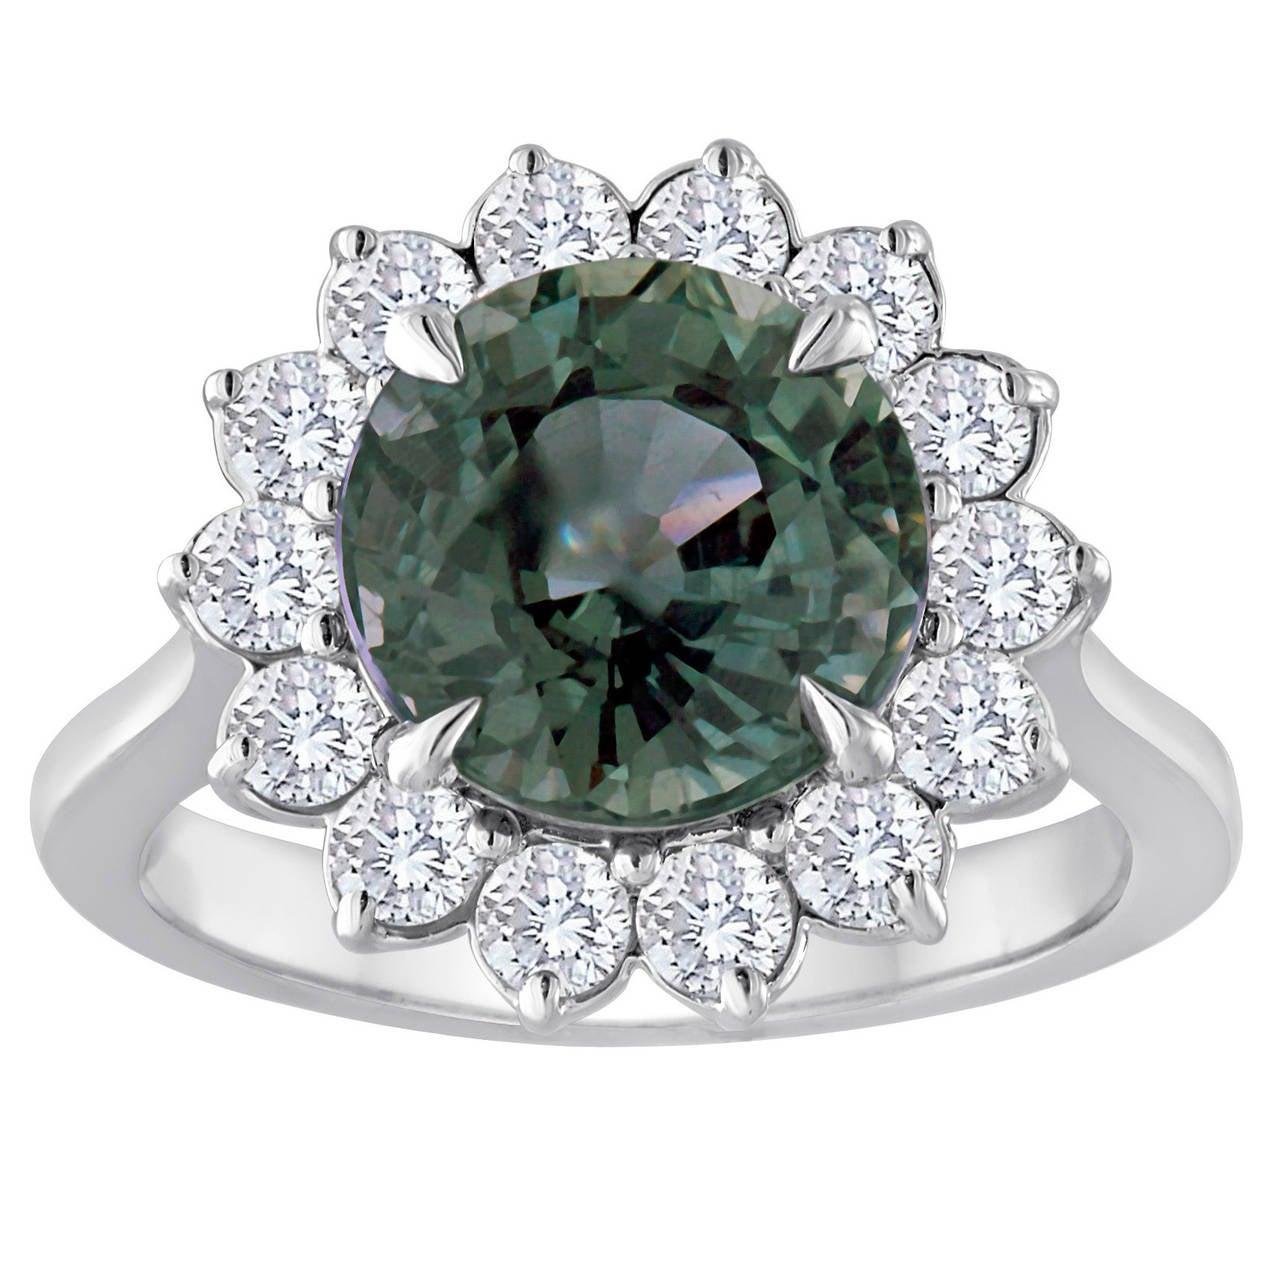 Certified No Heat 5.03 Carat Grayish Blue Sapphire Diamond Ring For Sale